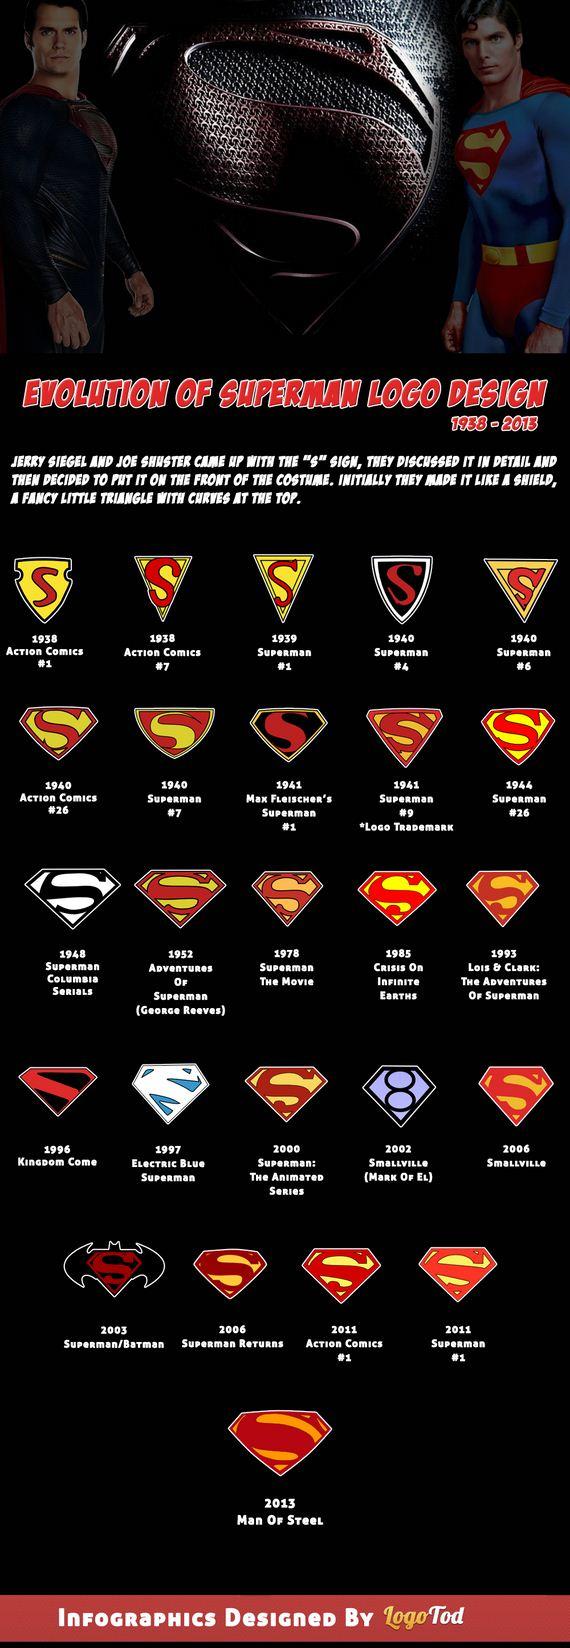 02-Infographic-on-SuperMan-Logo